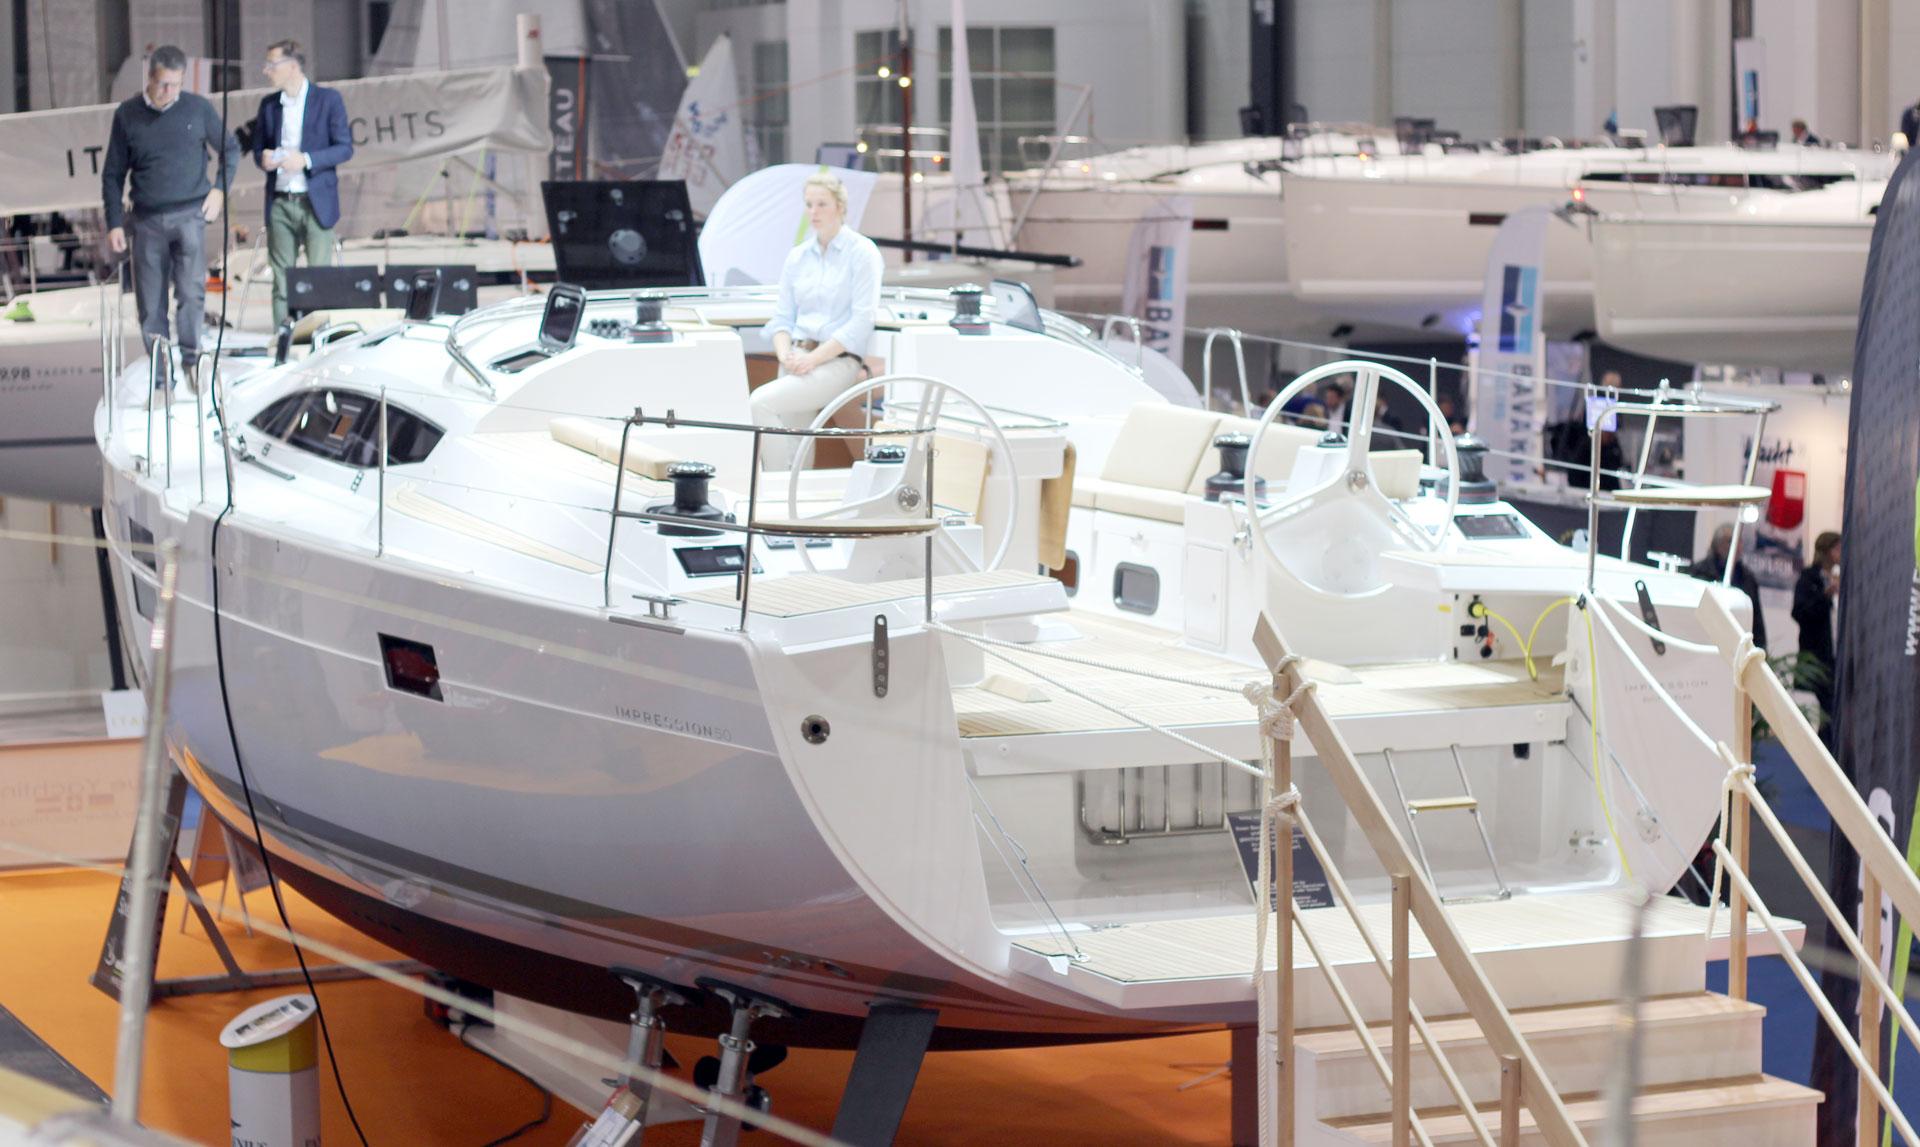 50 feet boats. Impressive.